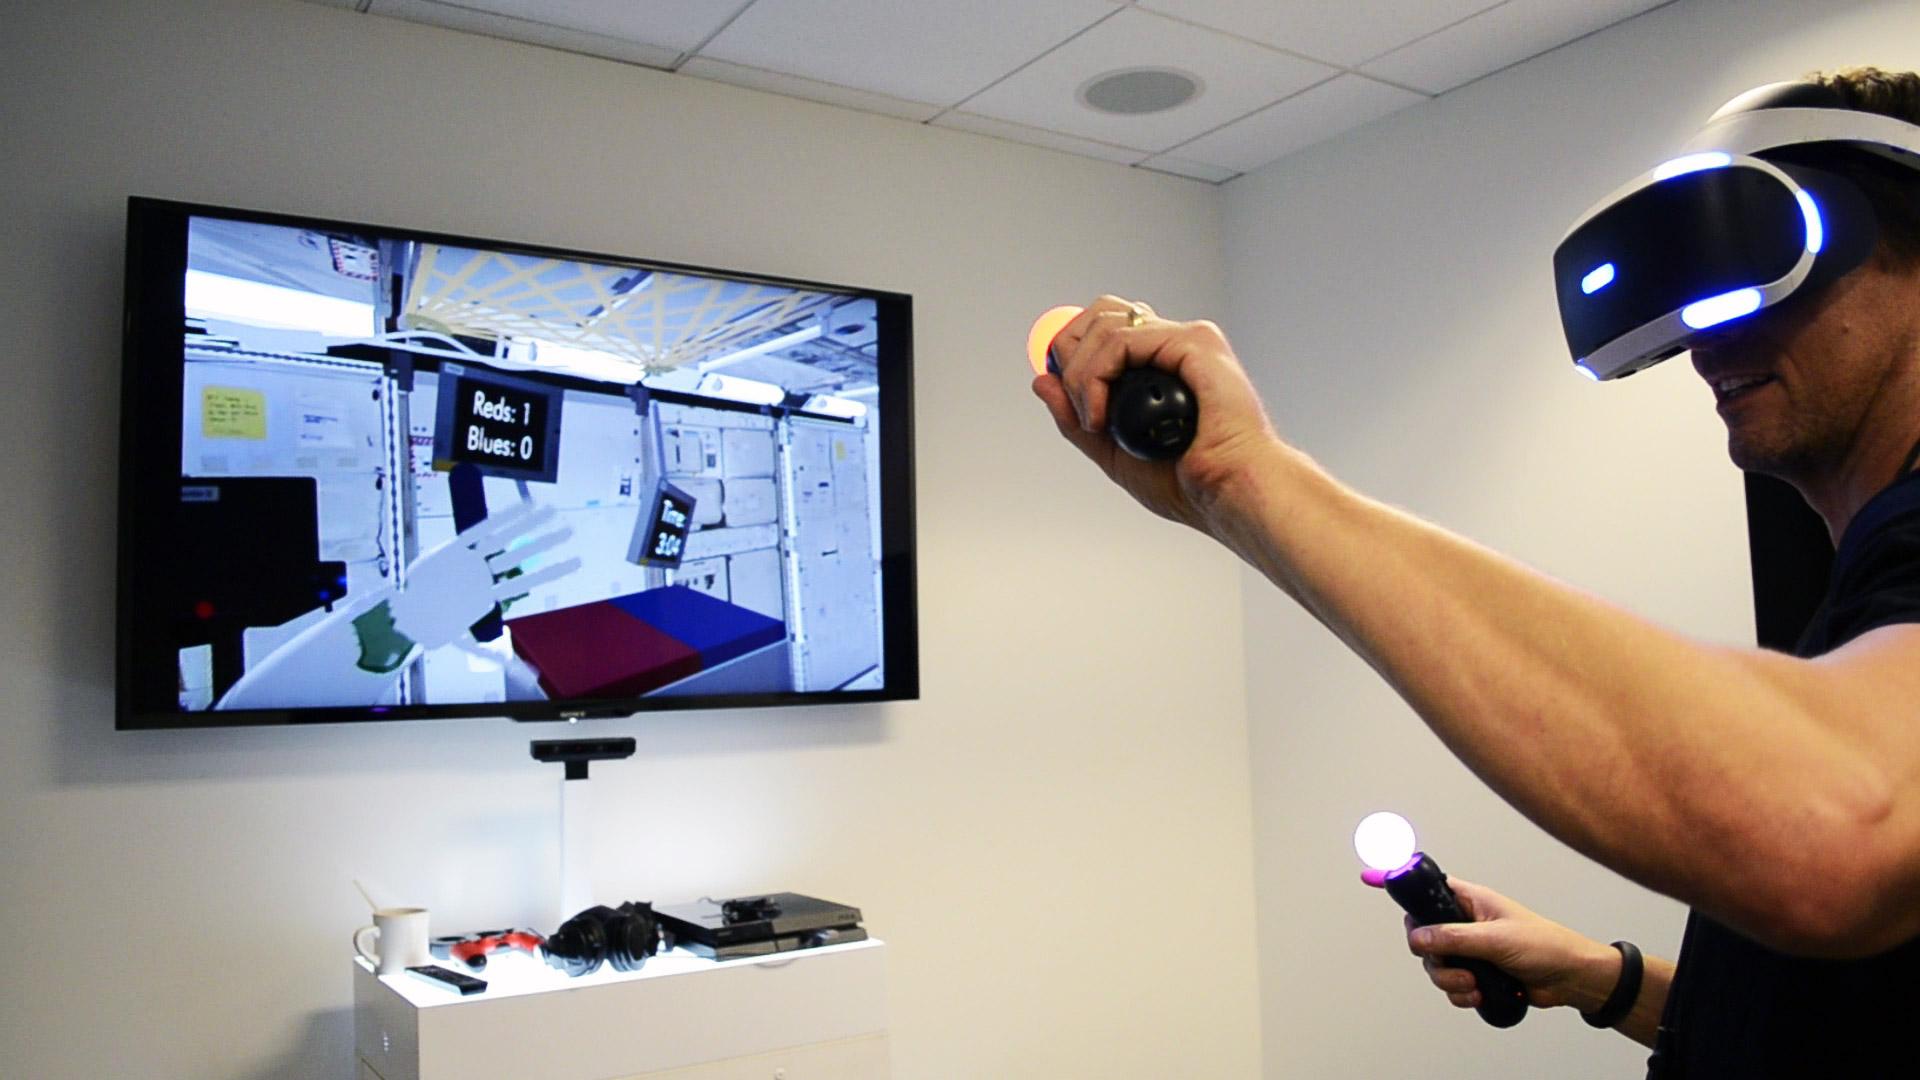 PlayStation VR + Move